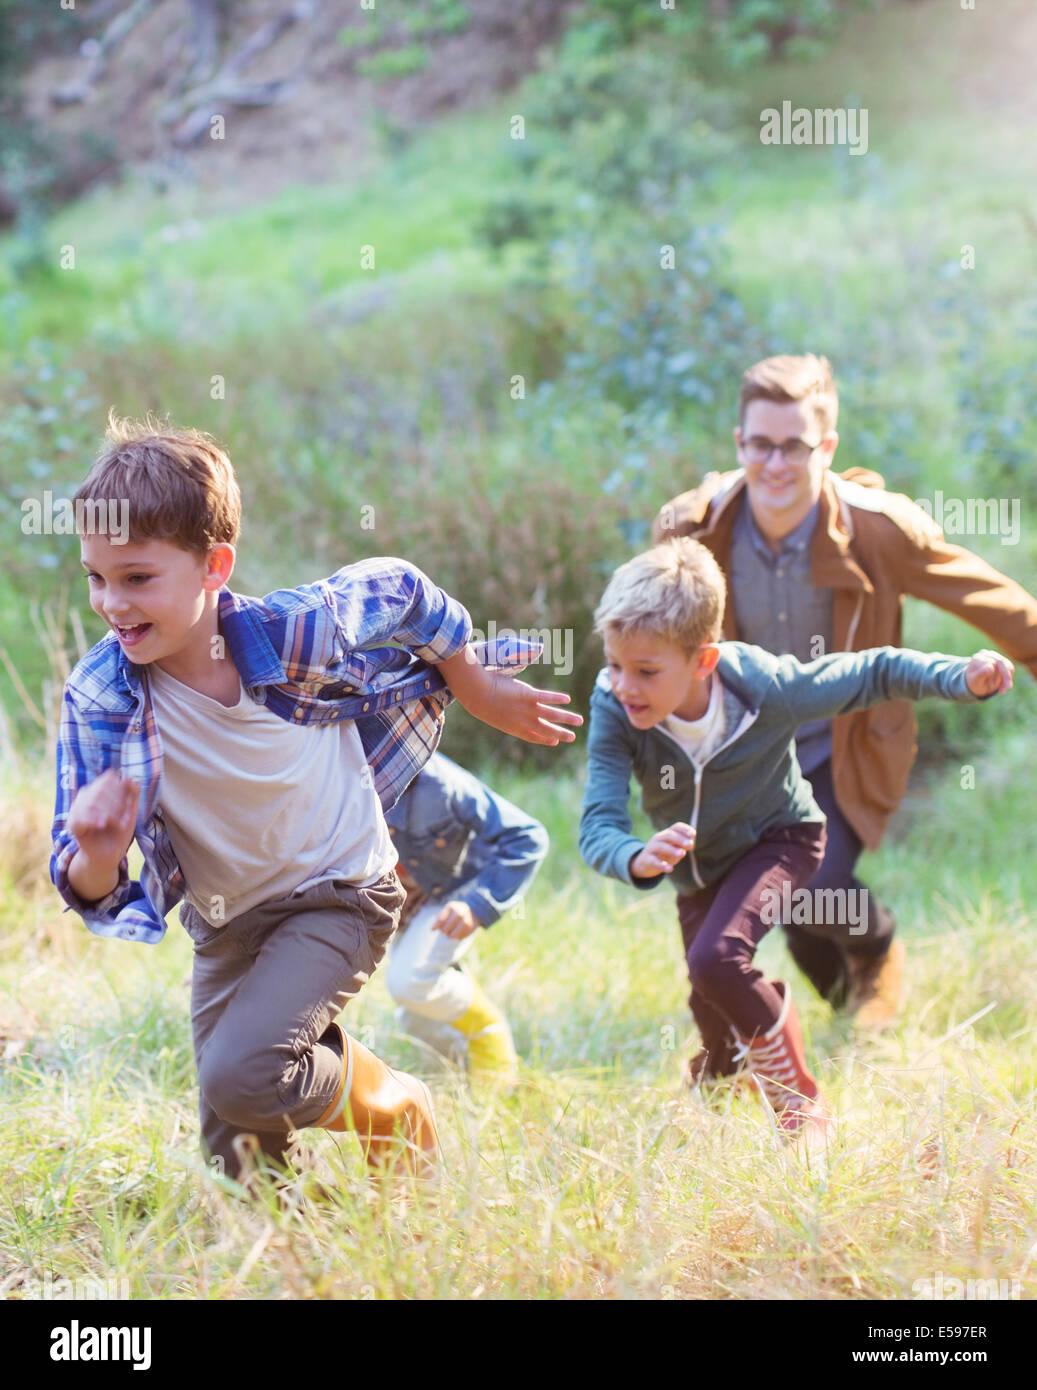 Boys running in field - Stock Image